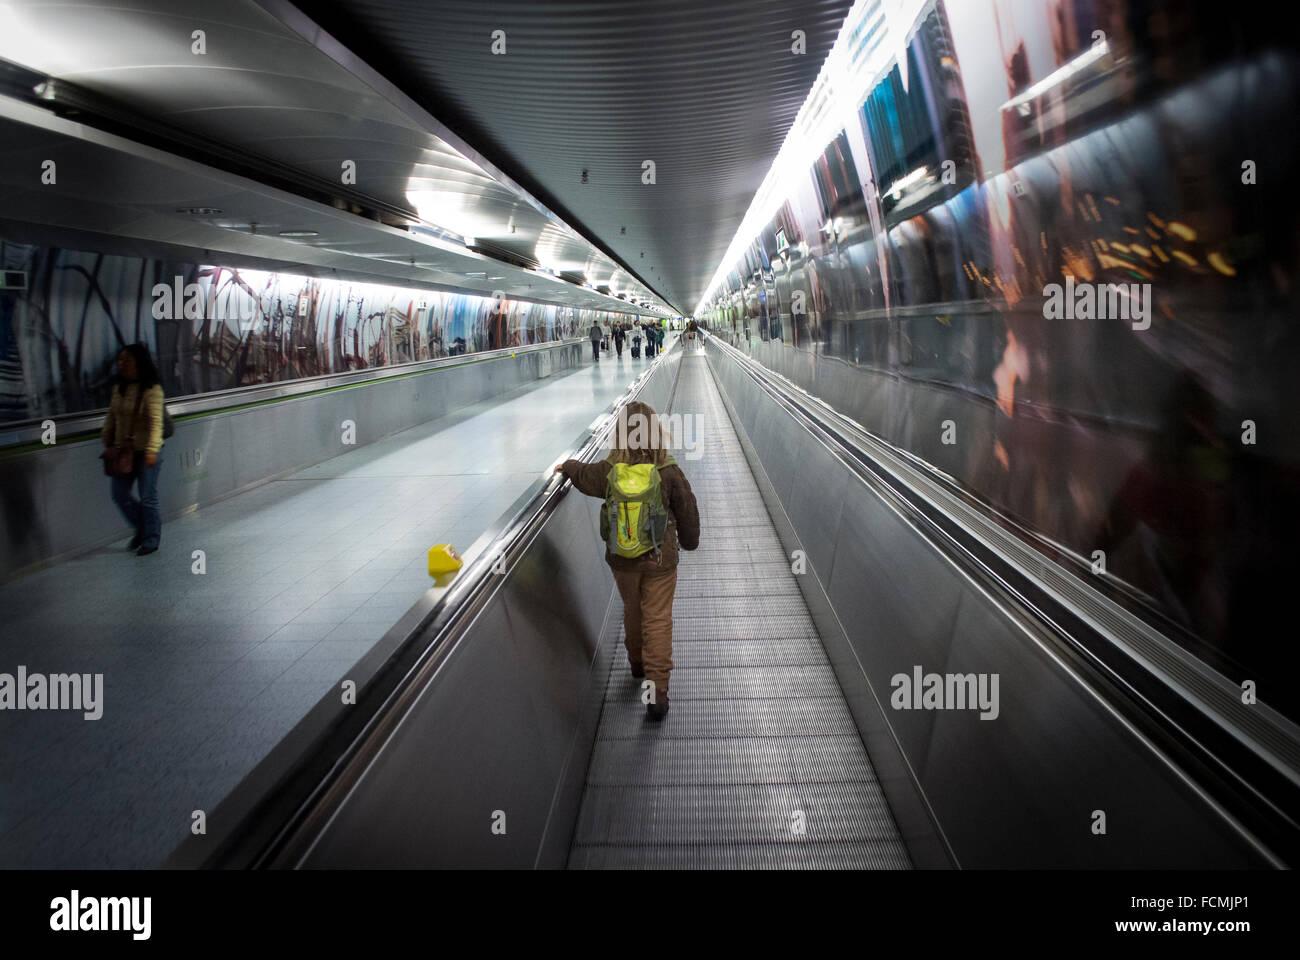 Young girl using the walkway between terminals at Frankfurt Airport, Germany. - Stock Image